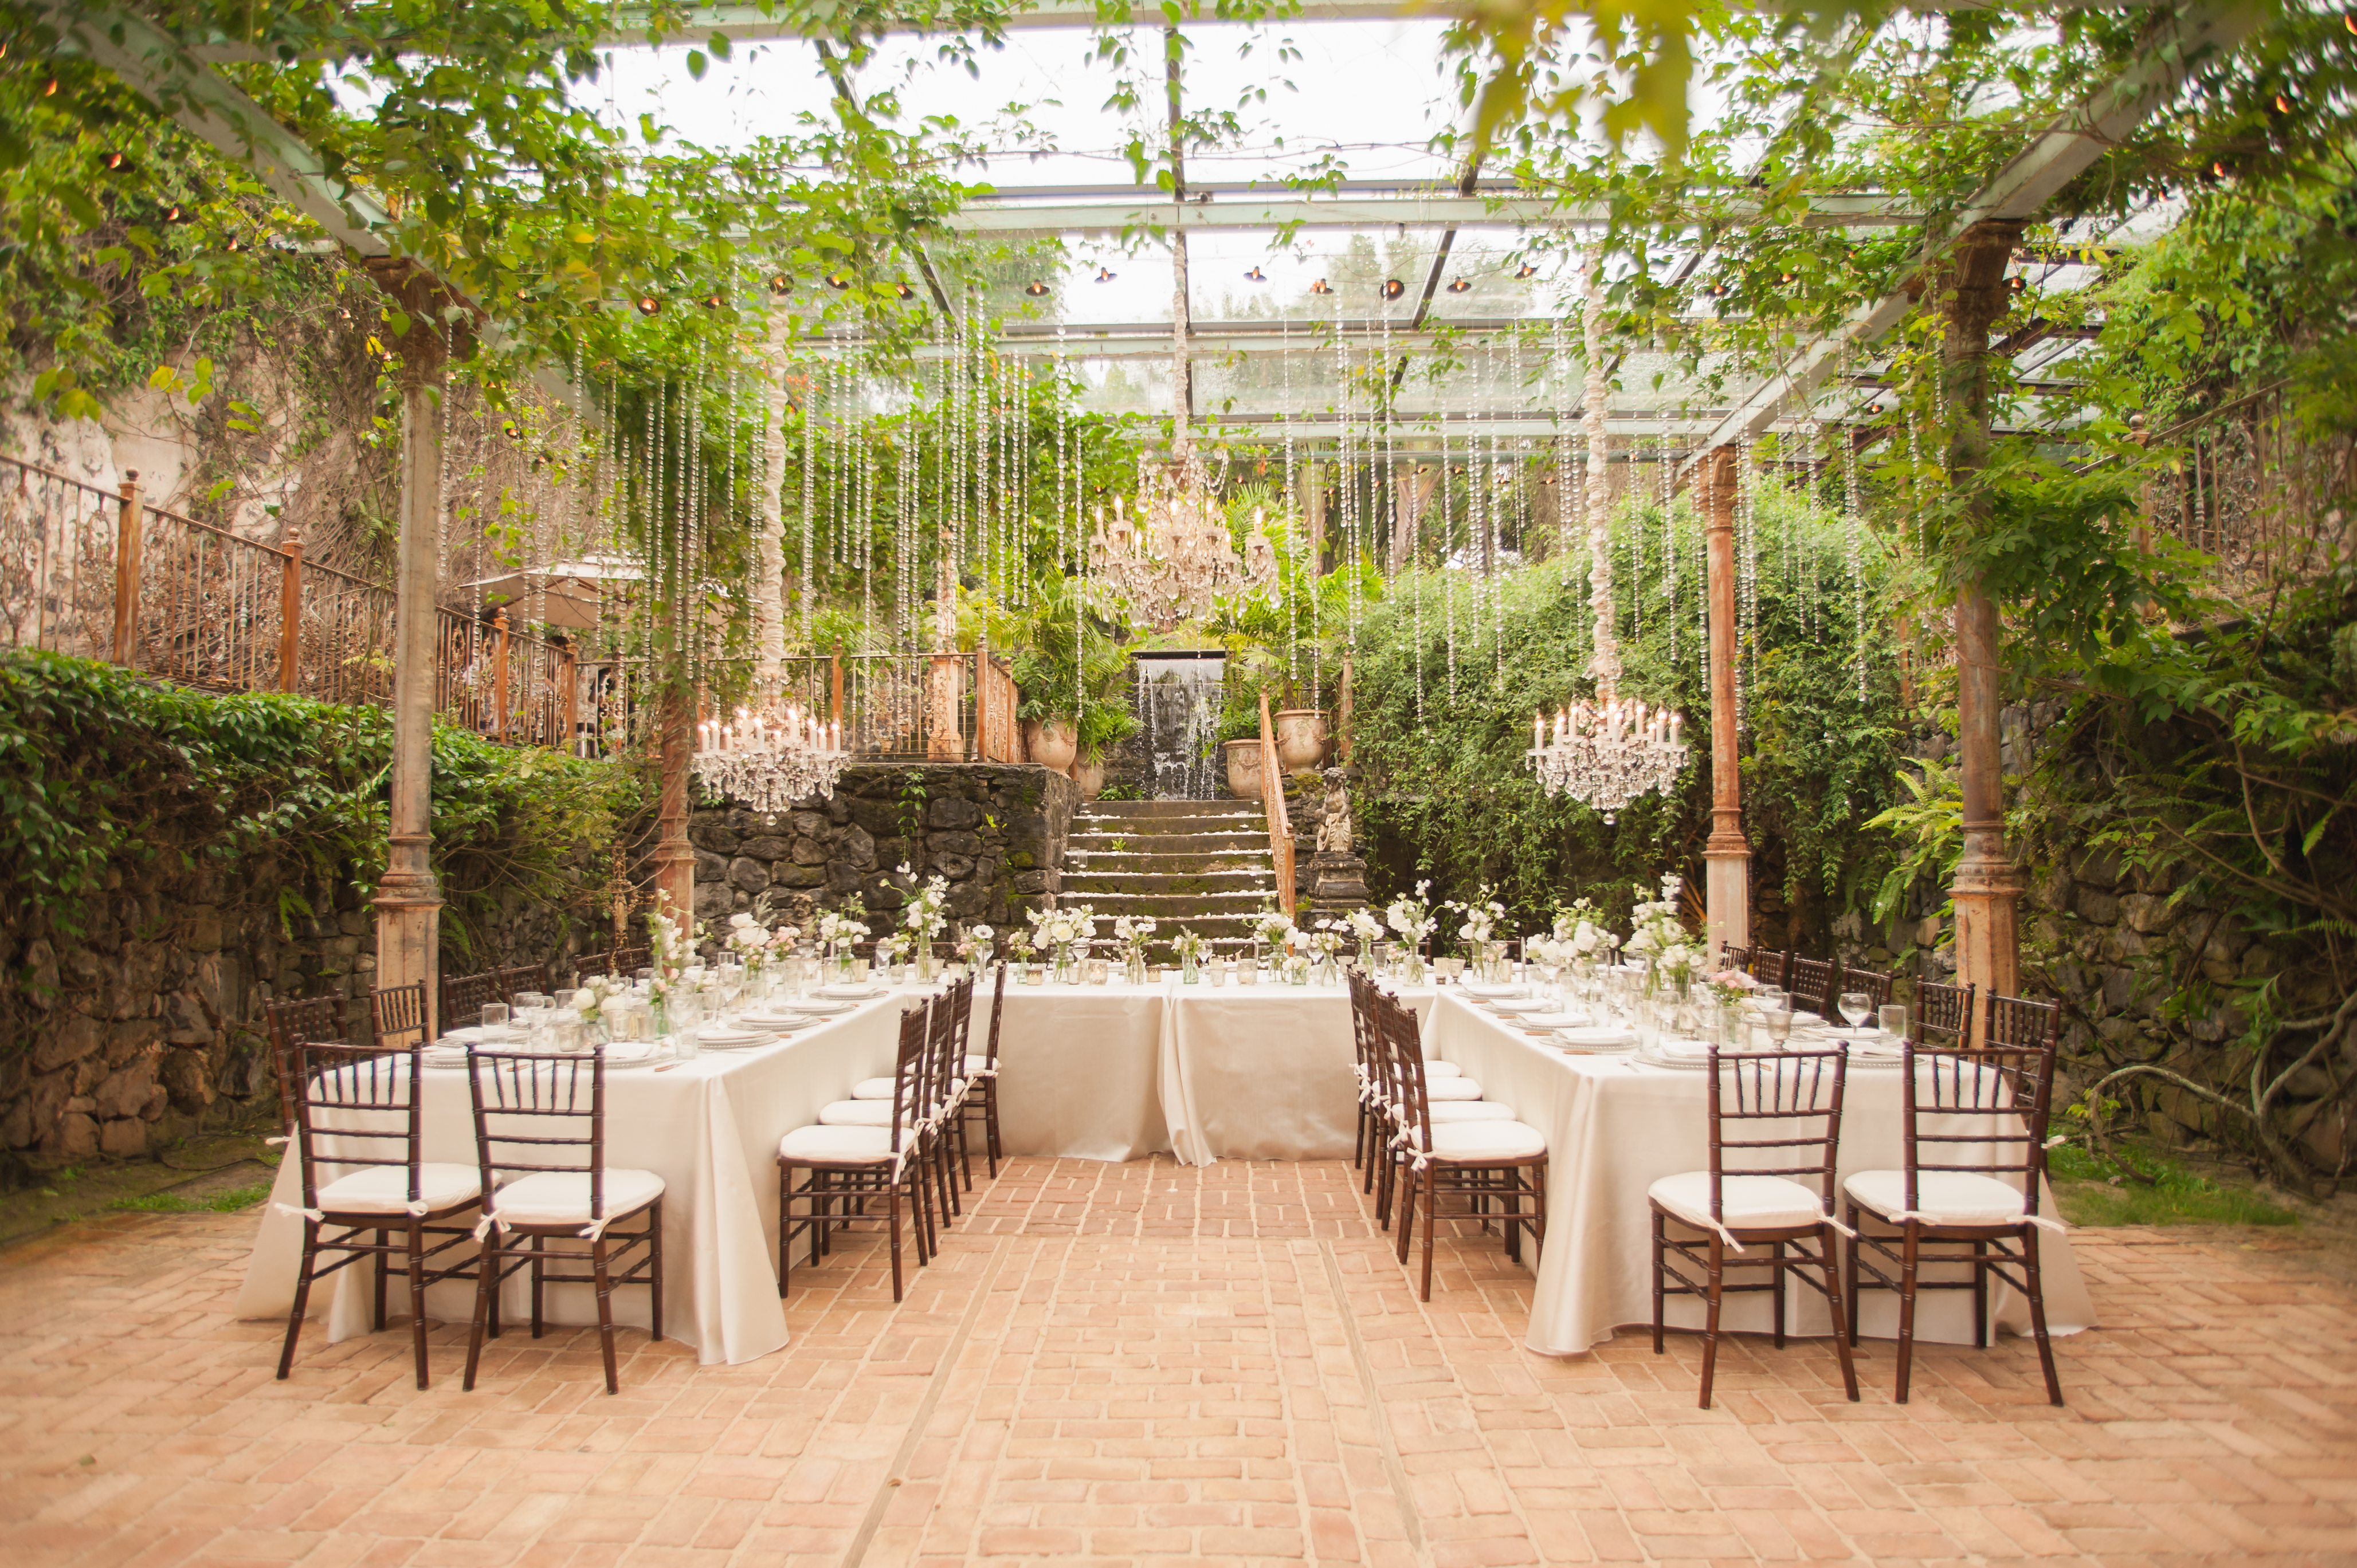 The DIY Backyard Wedding on a Budget